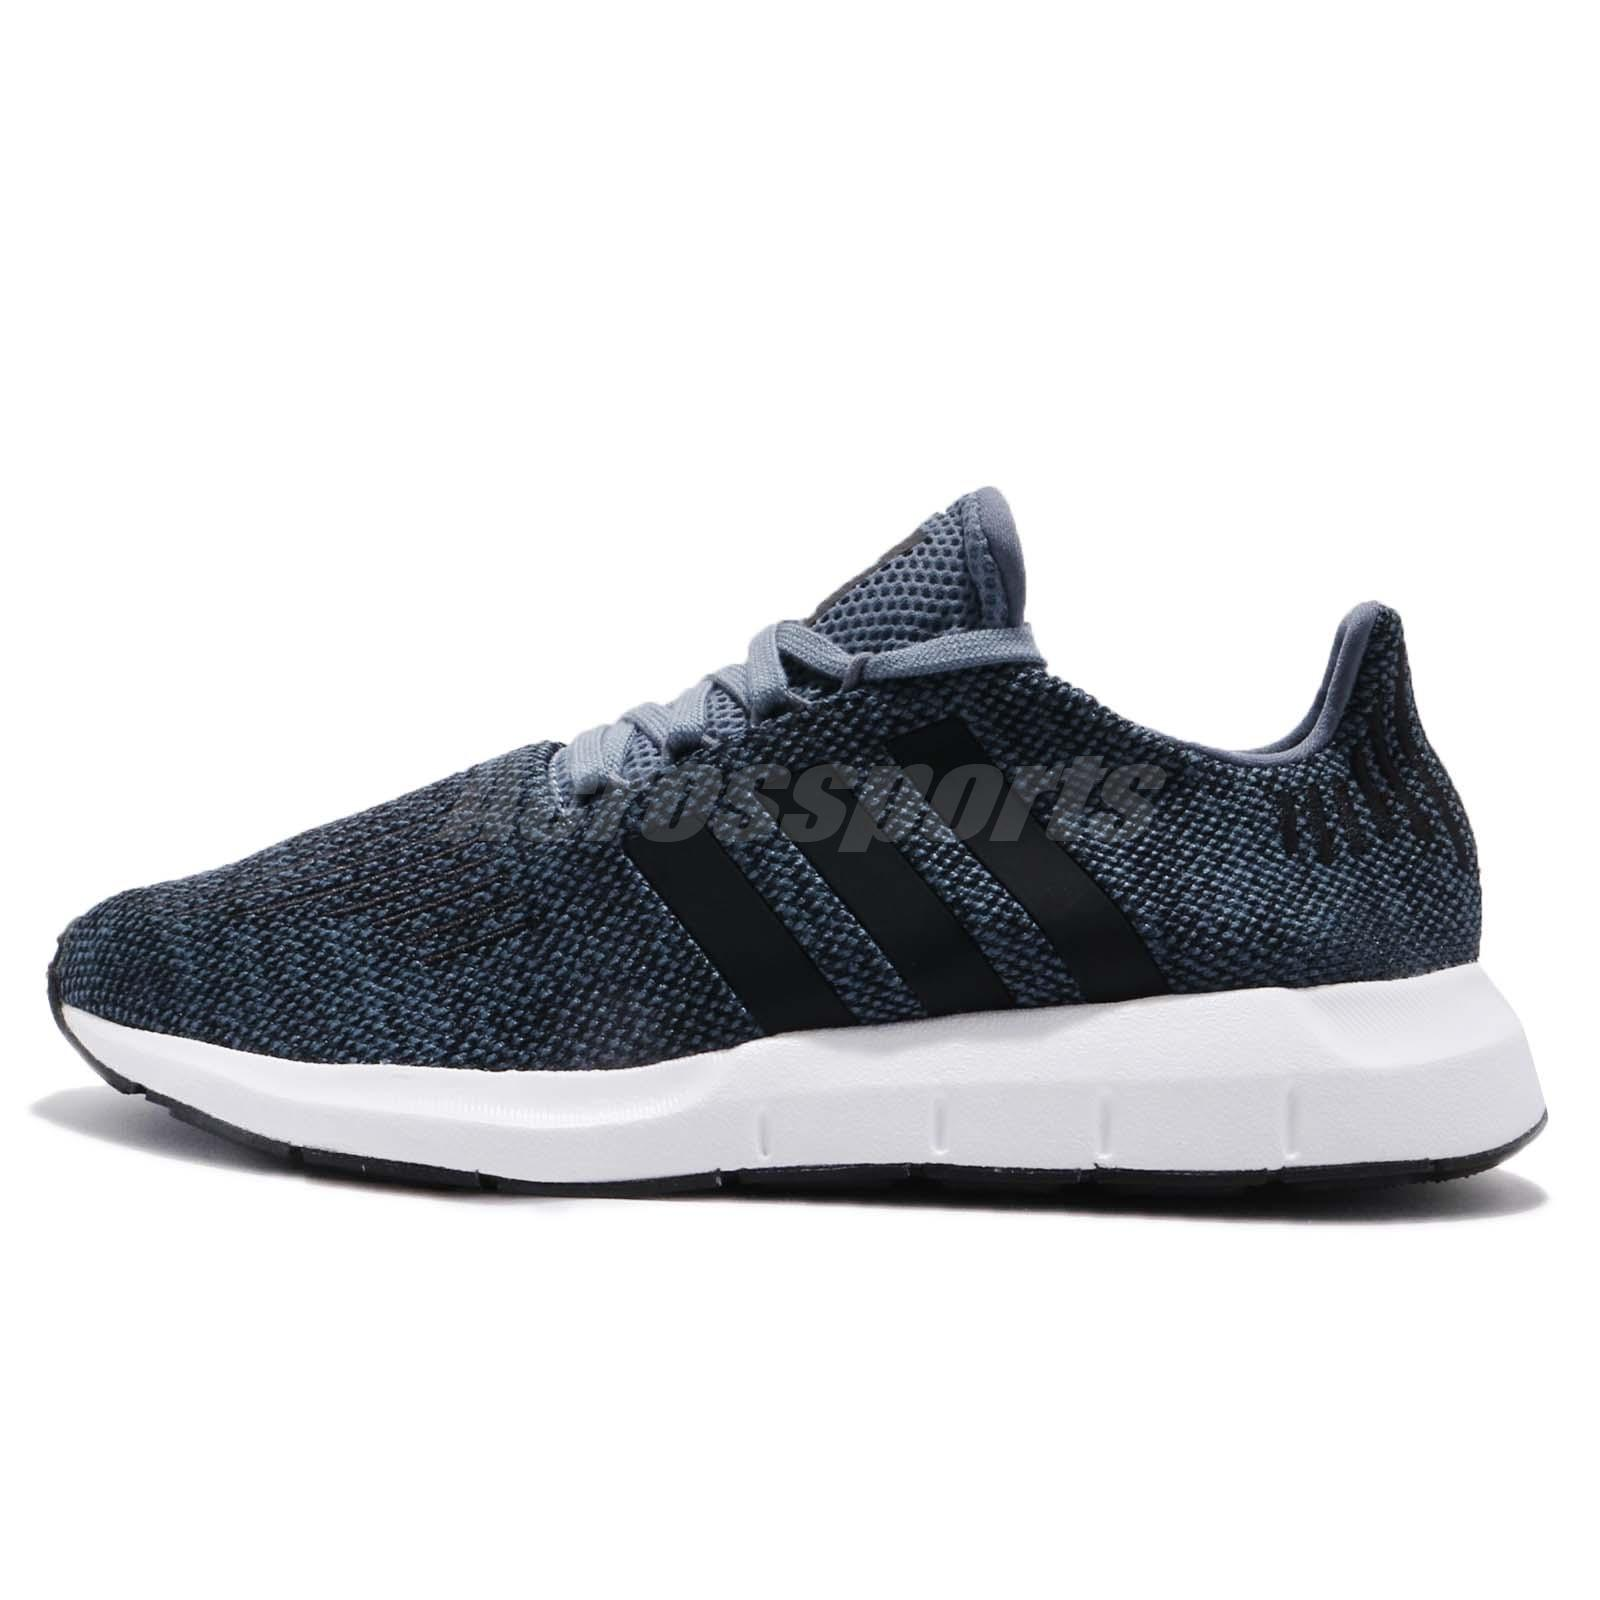 c6d303796 adidas Swift Run Raw Steel Navy Black Men Running Shoes Sneakers CQ2120